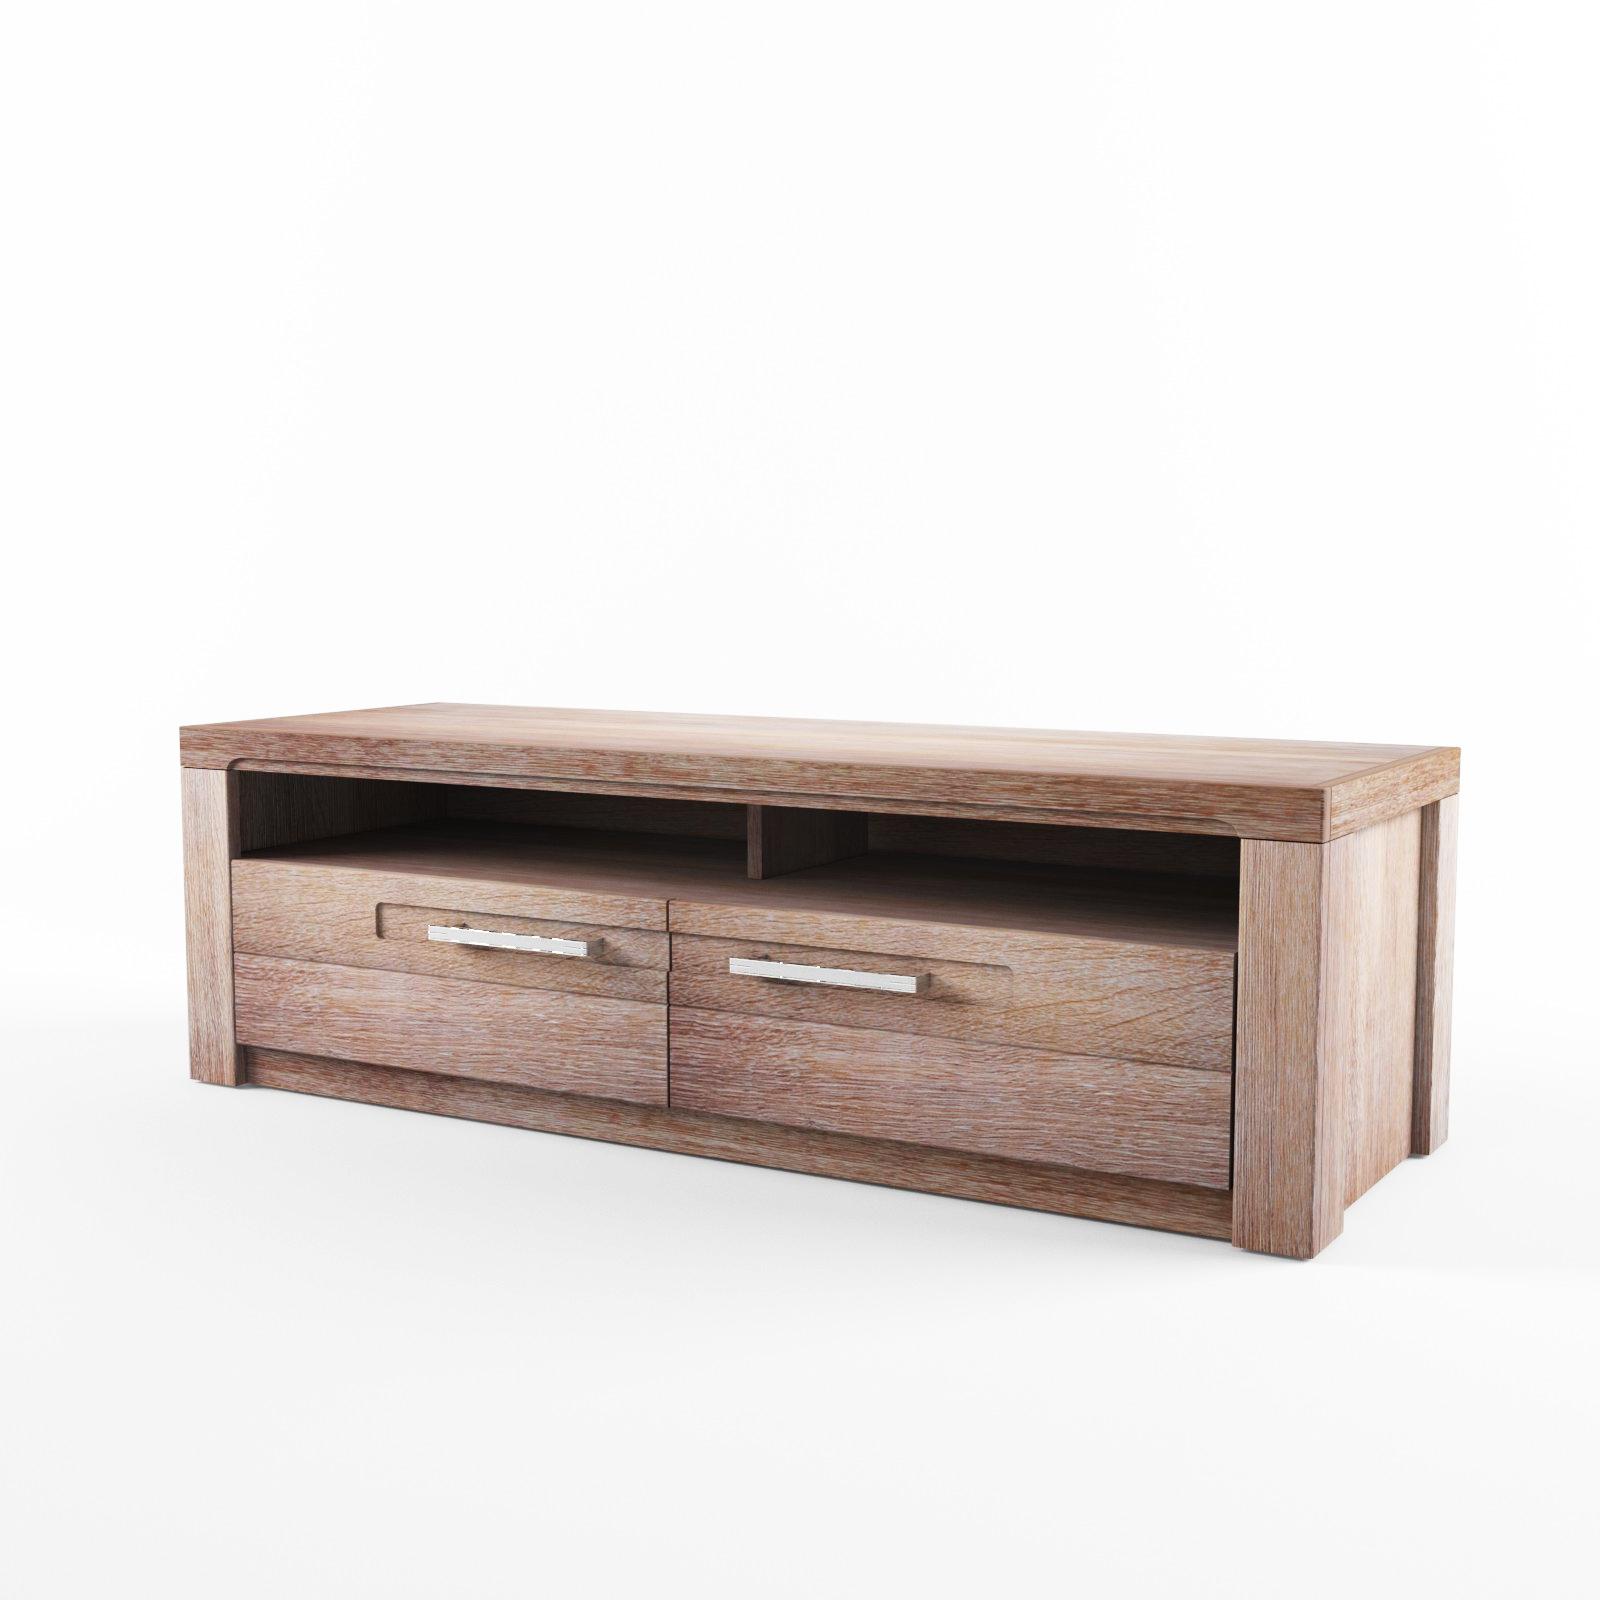 massivholzmöbel lowboard eiche massiv möbel echtholz eichenmöbel